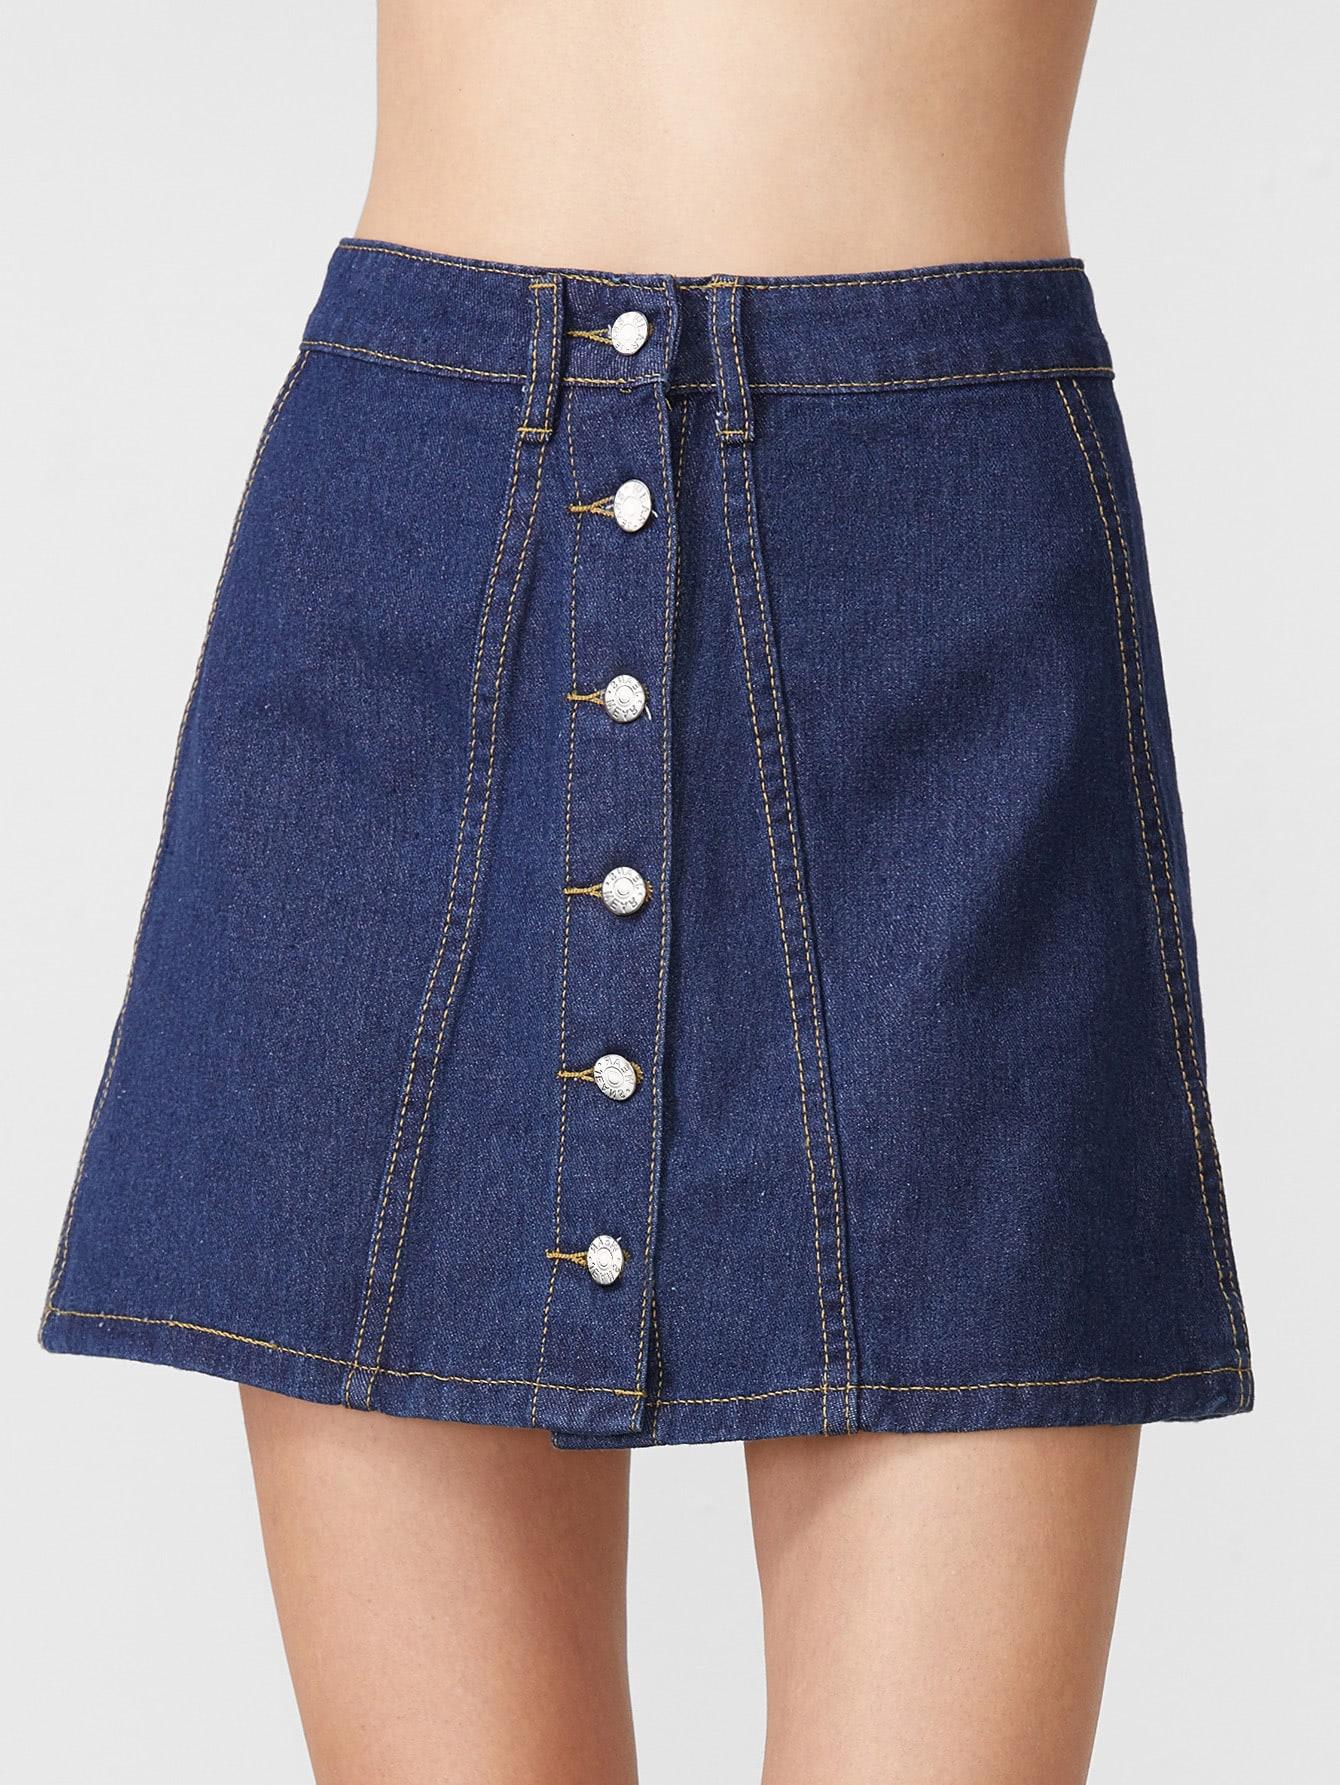 Deep Blue Single Breasted A Line Denim Skirt